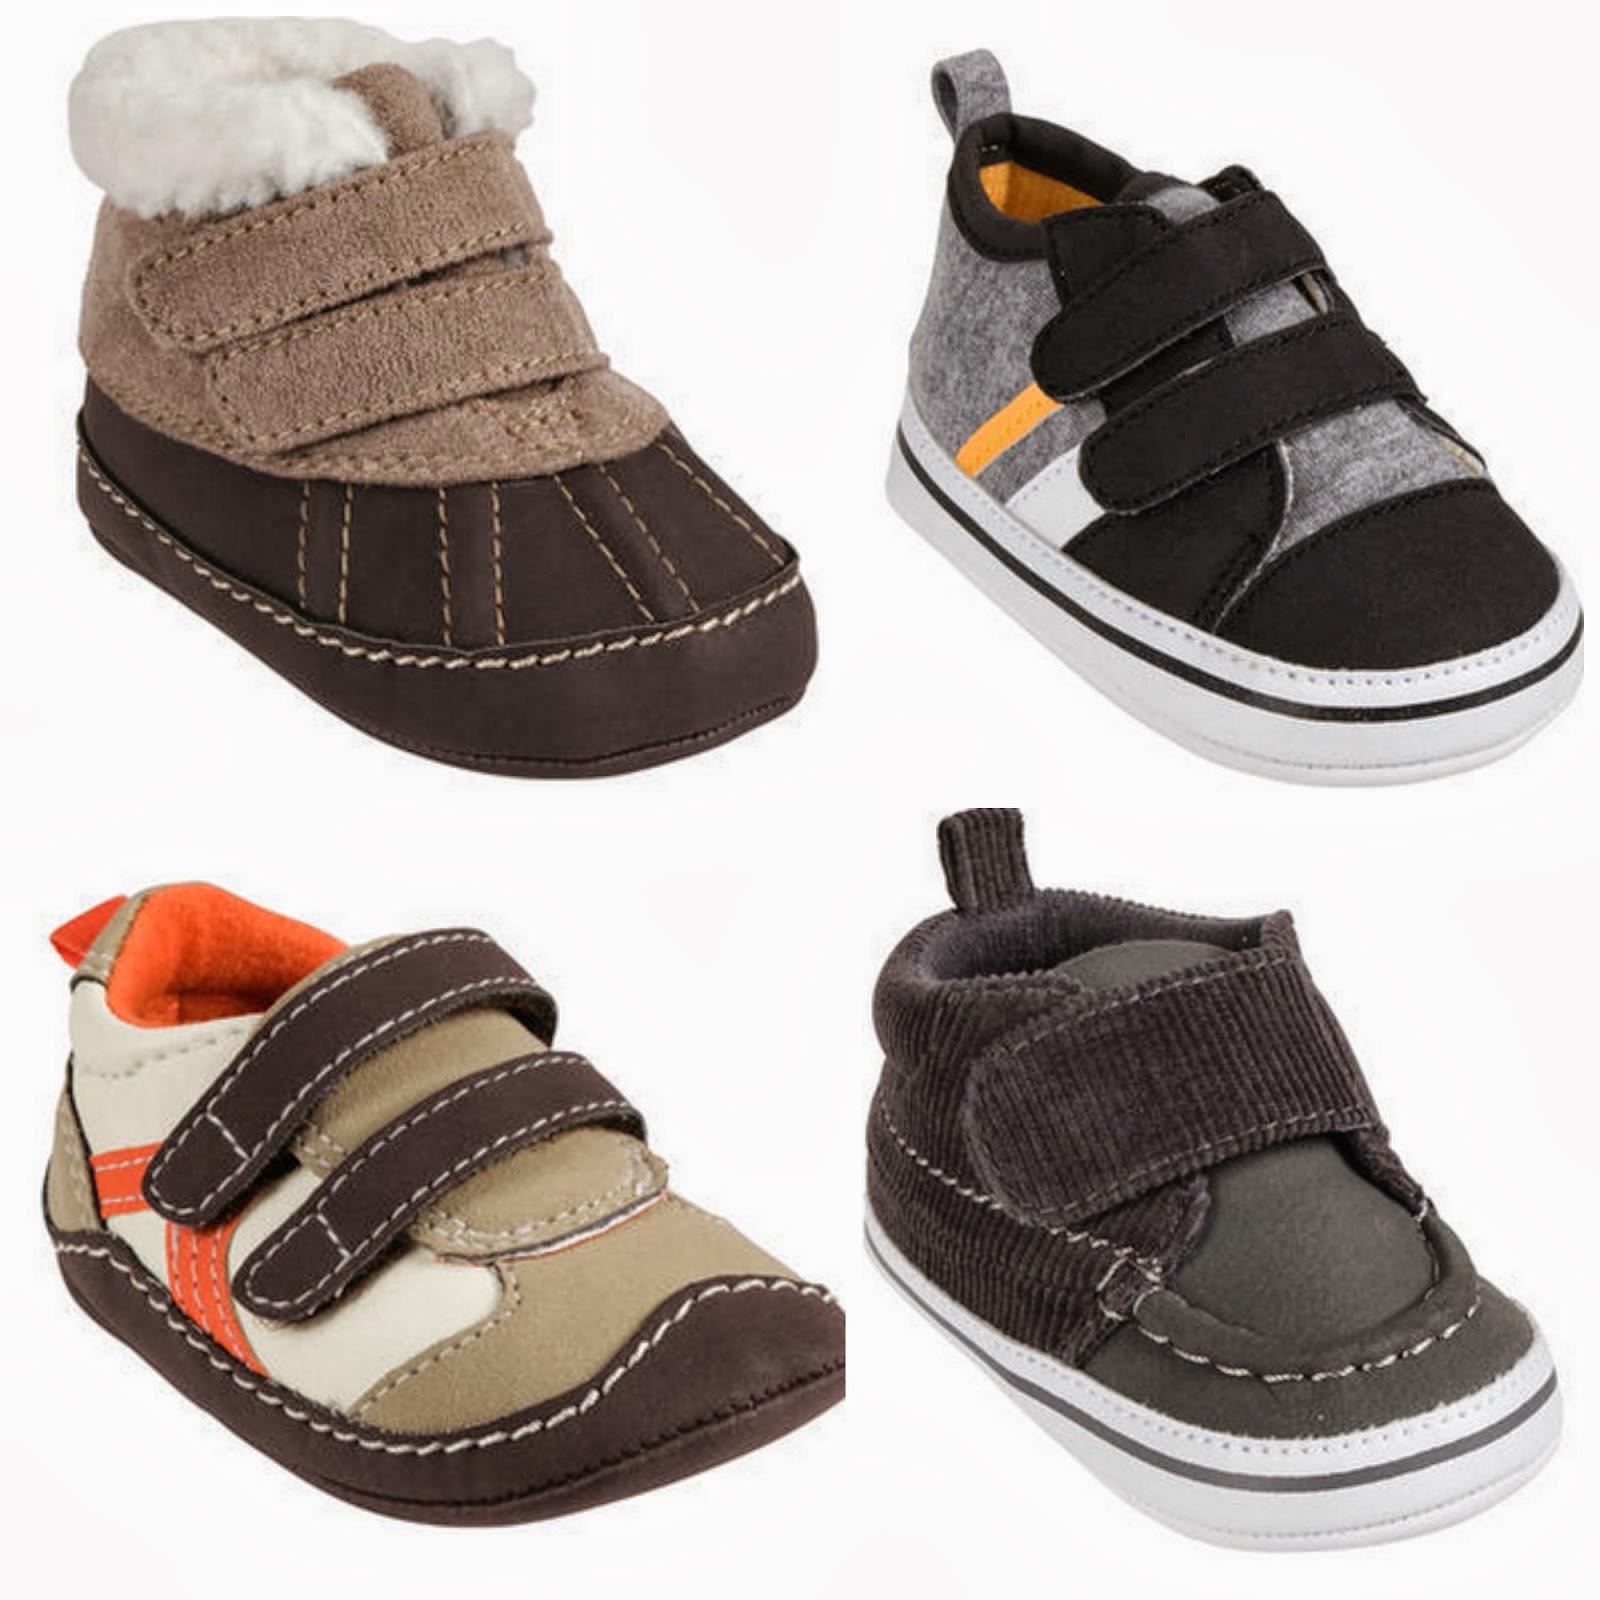 Carter S Shoe Size Guide